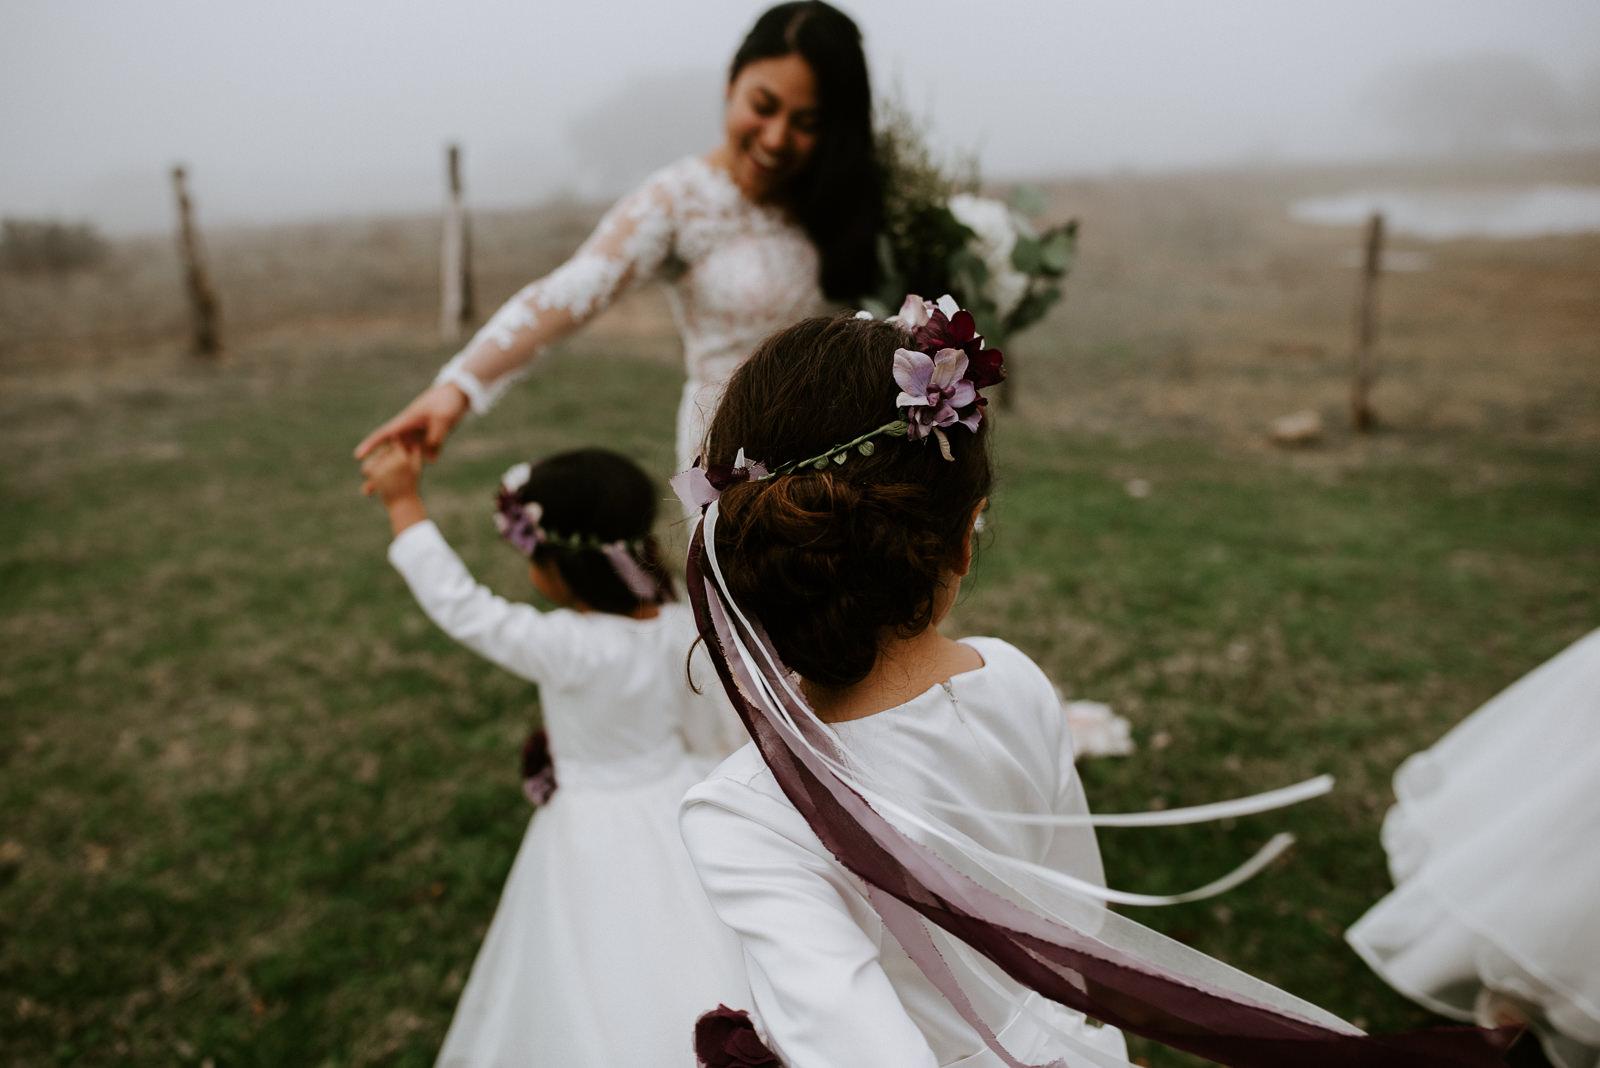 flower girls dance in a field after wedding